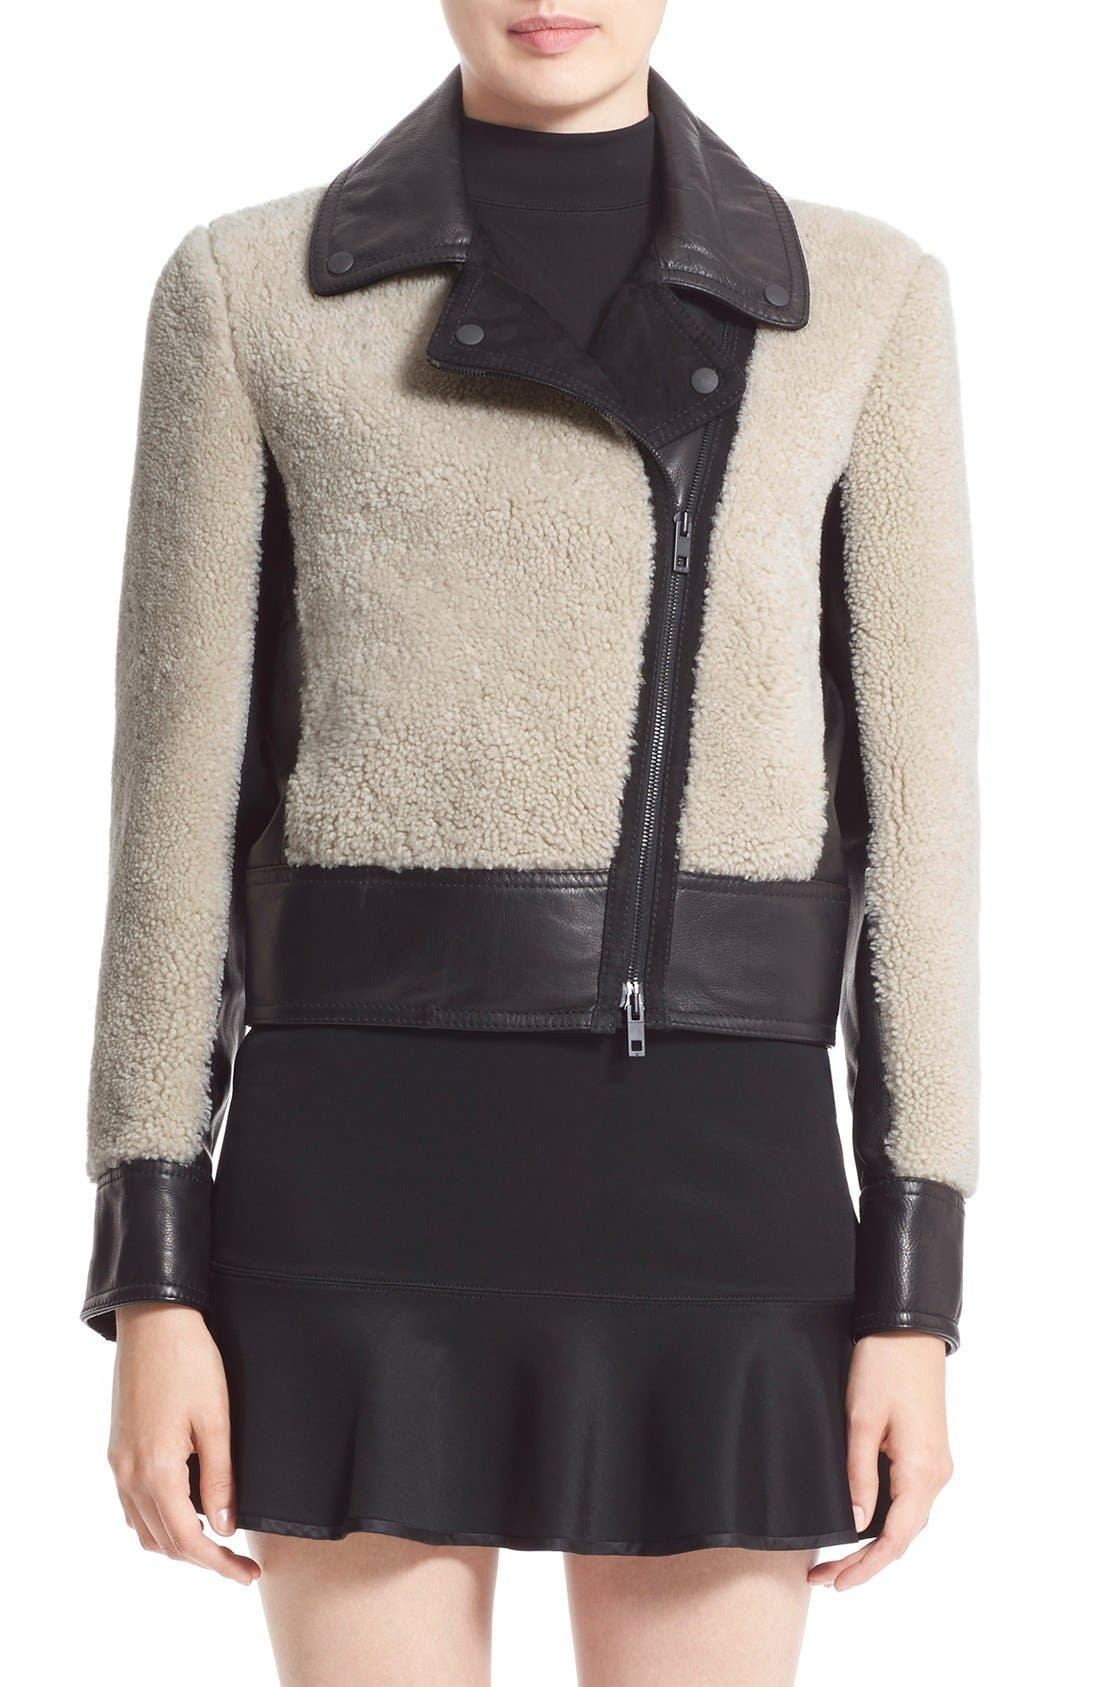 Alternate Image 1 Selected - rag & bone 'Billie' Leather TrimGenuine Shearling Jacket